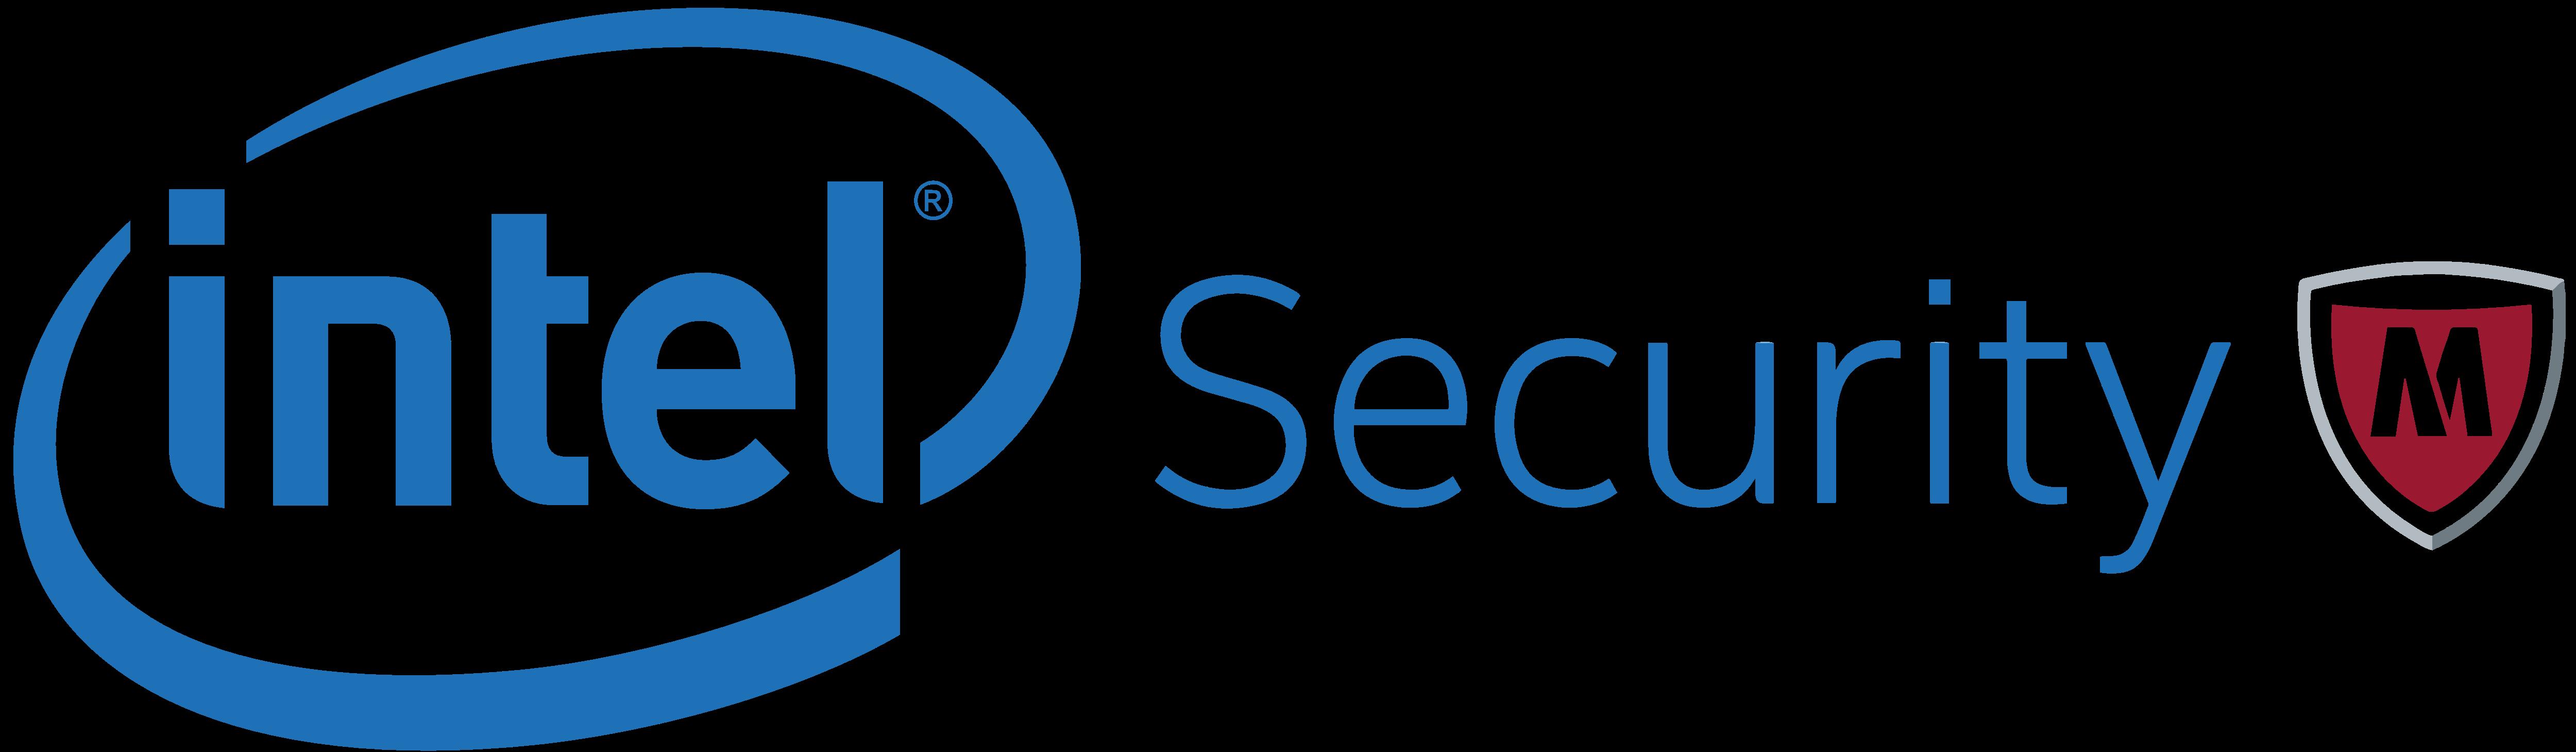 5000x1459 Intel Security Mcafee Logos Download